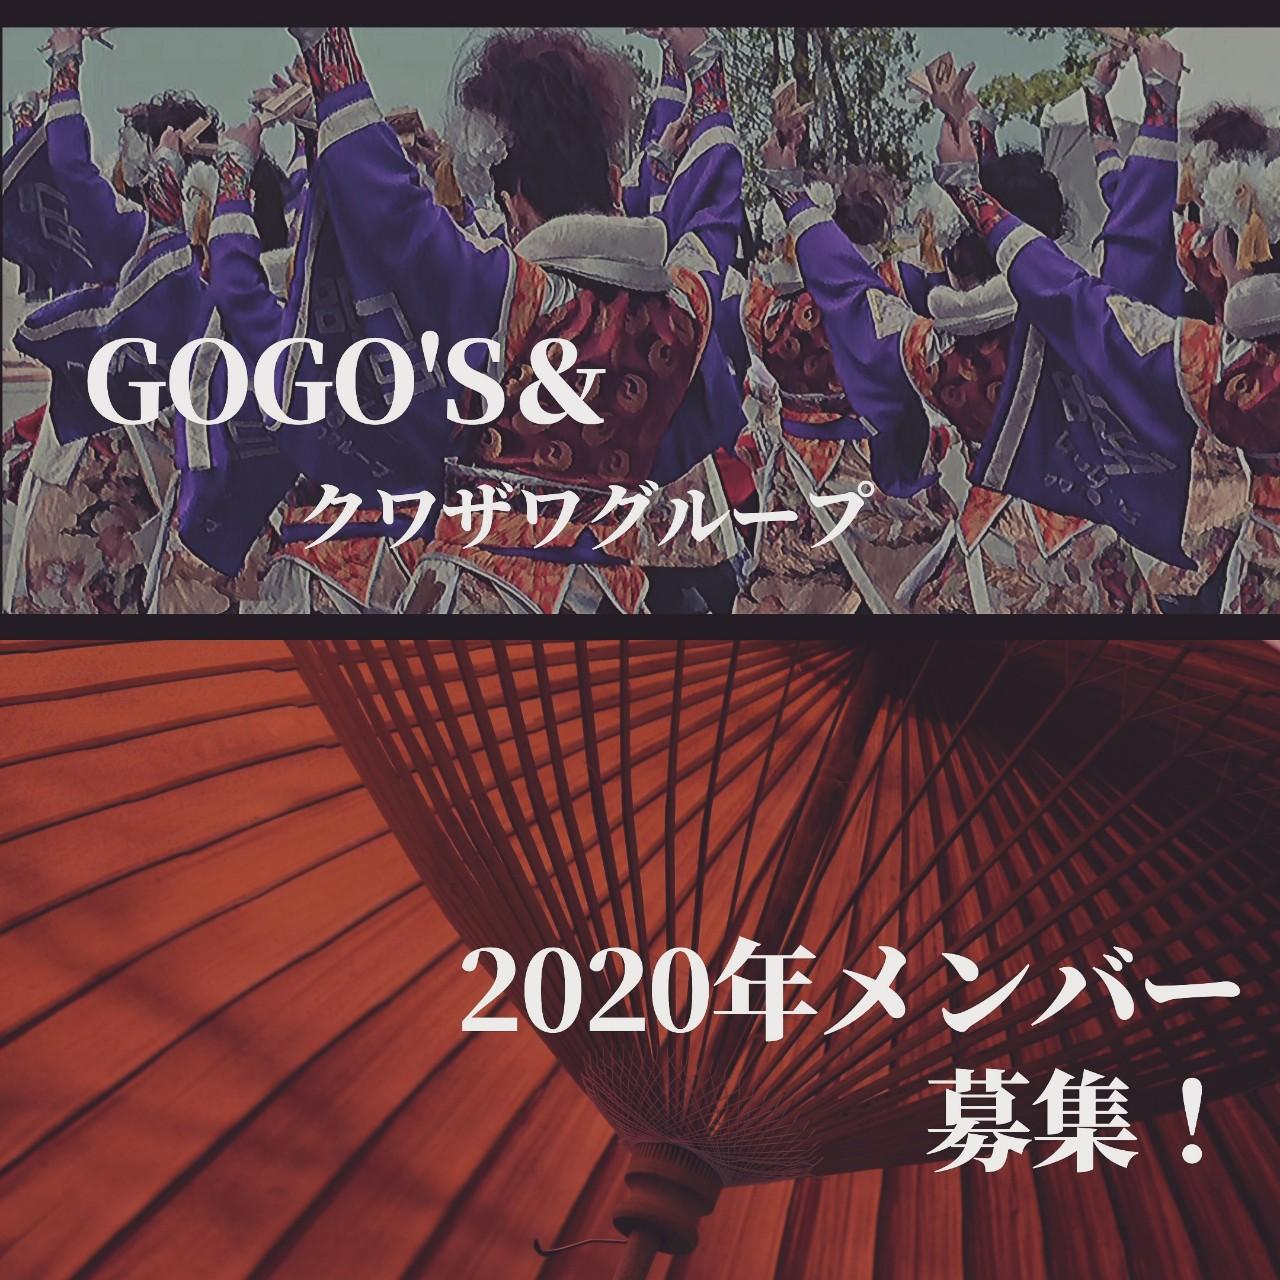 GOGO'S 2020メンバー募集